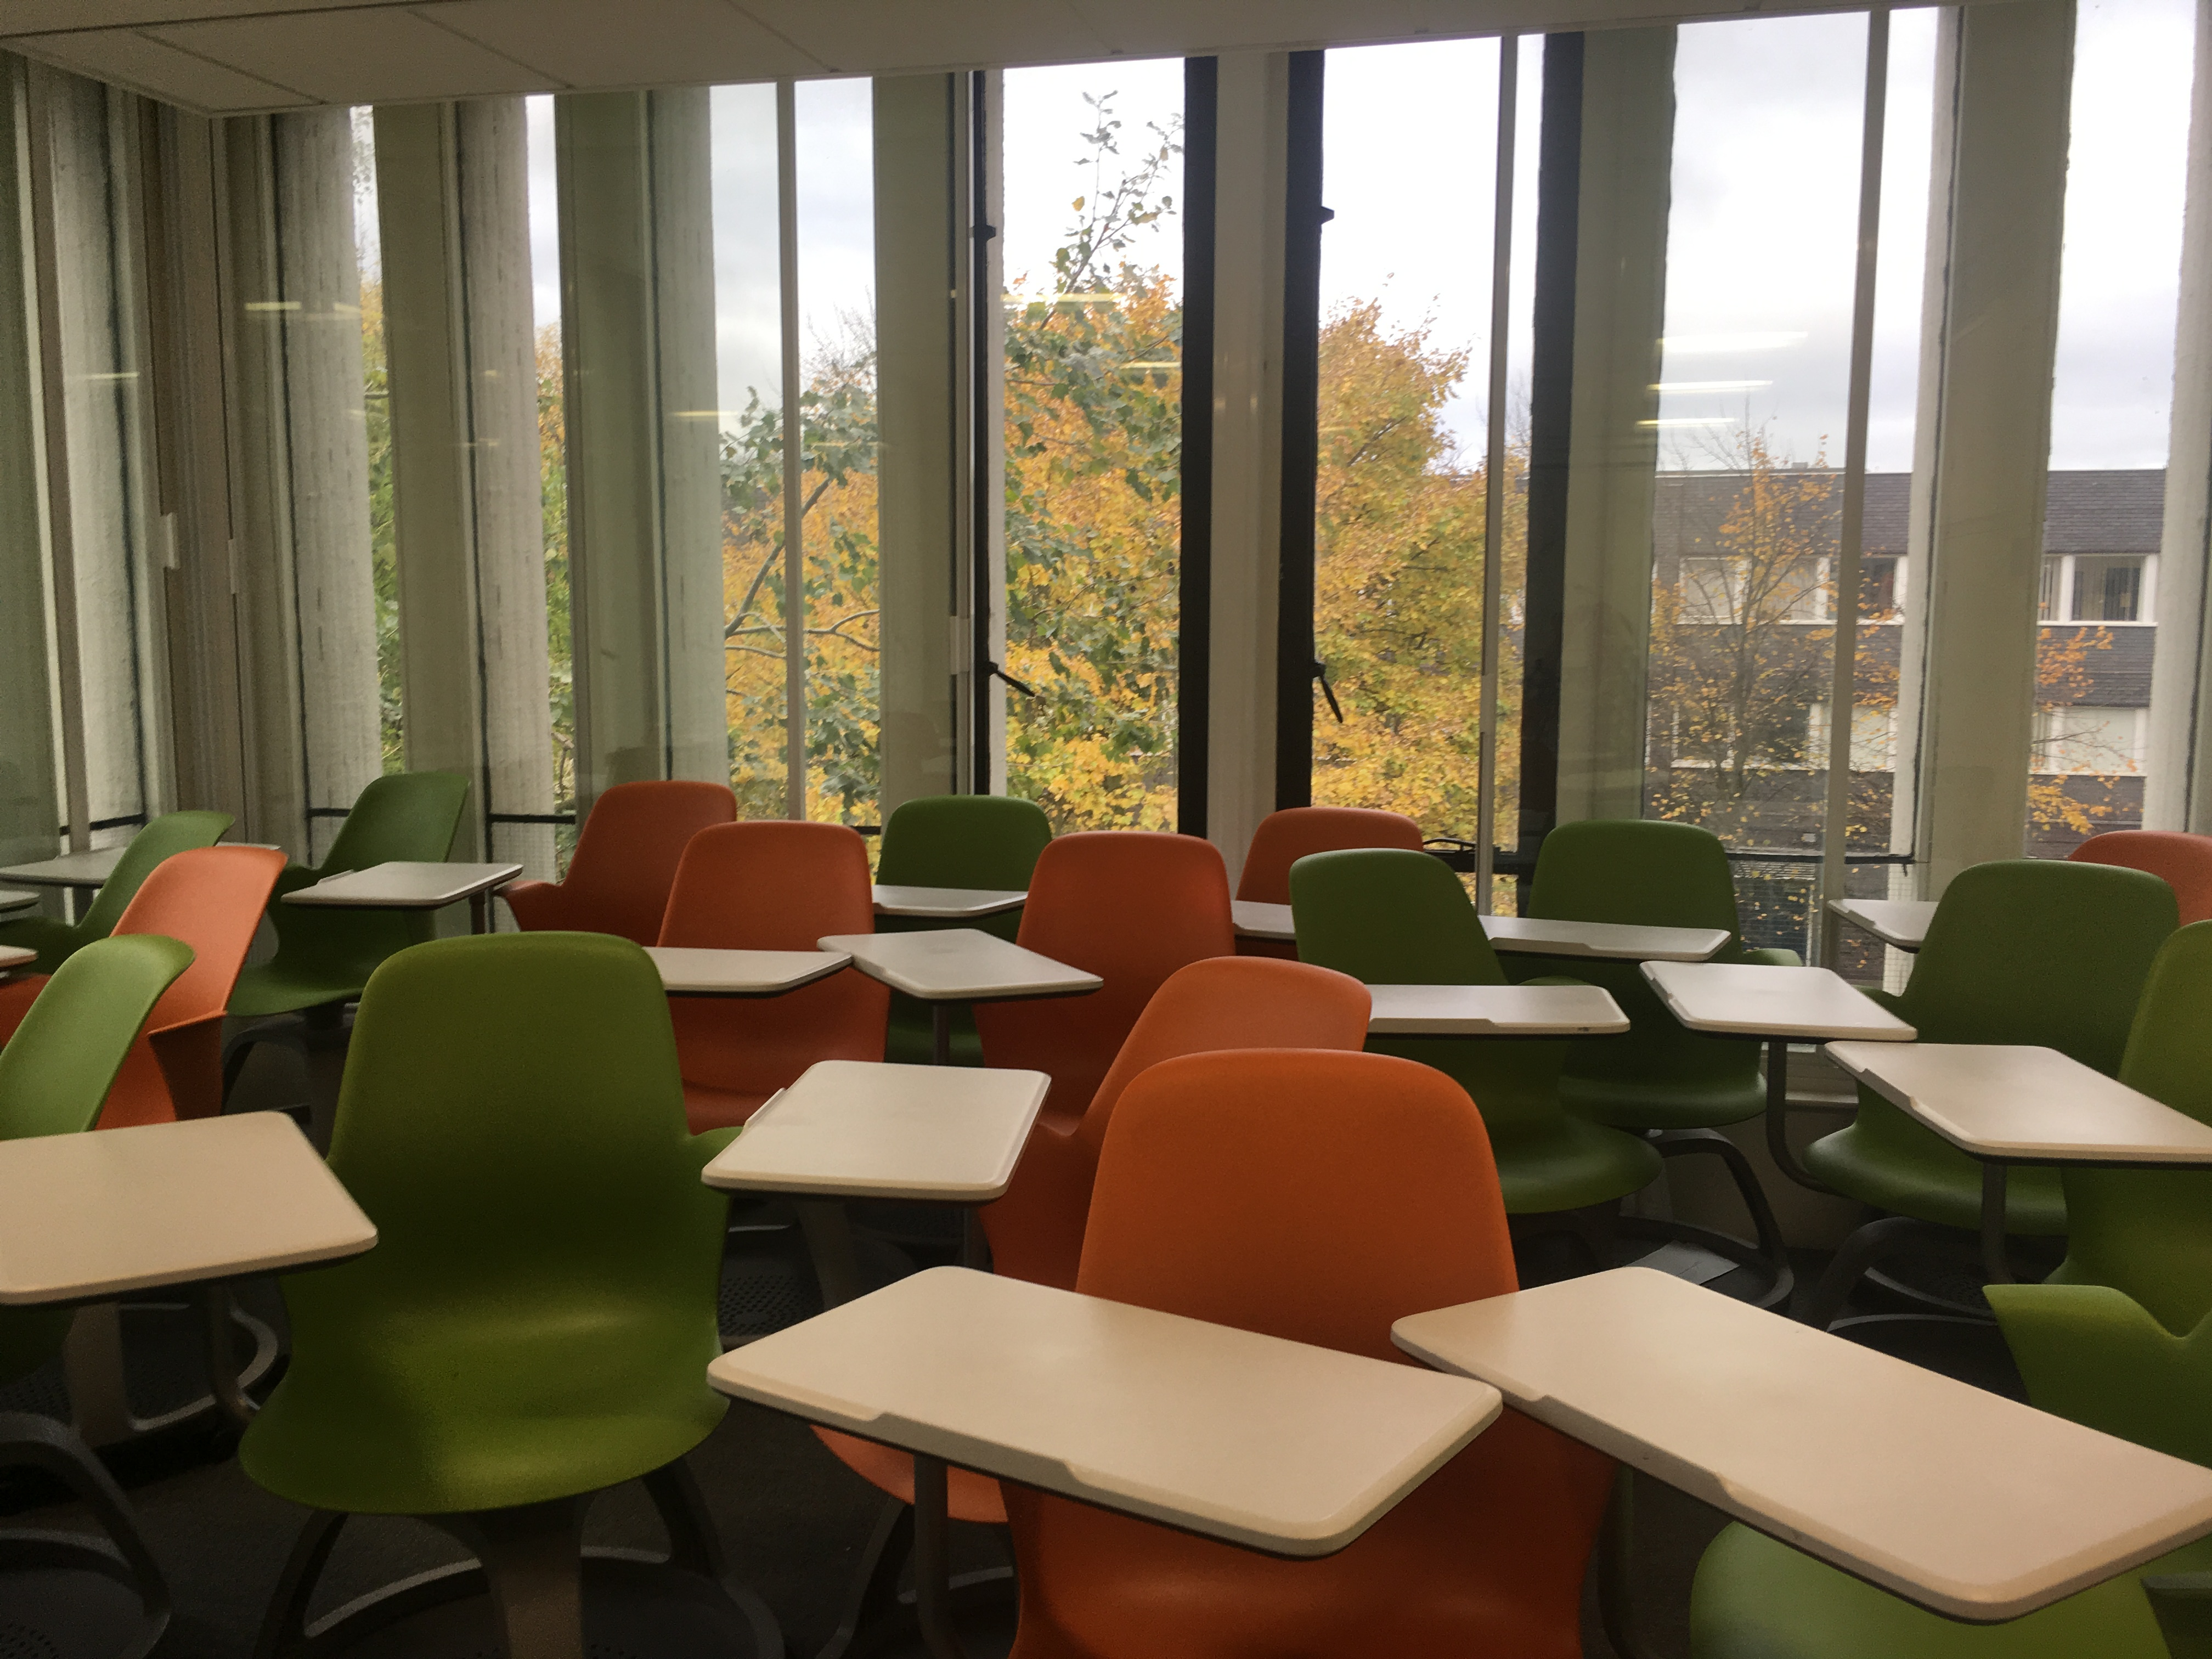 south campus teaching hub